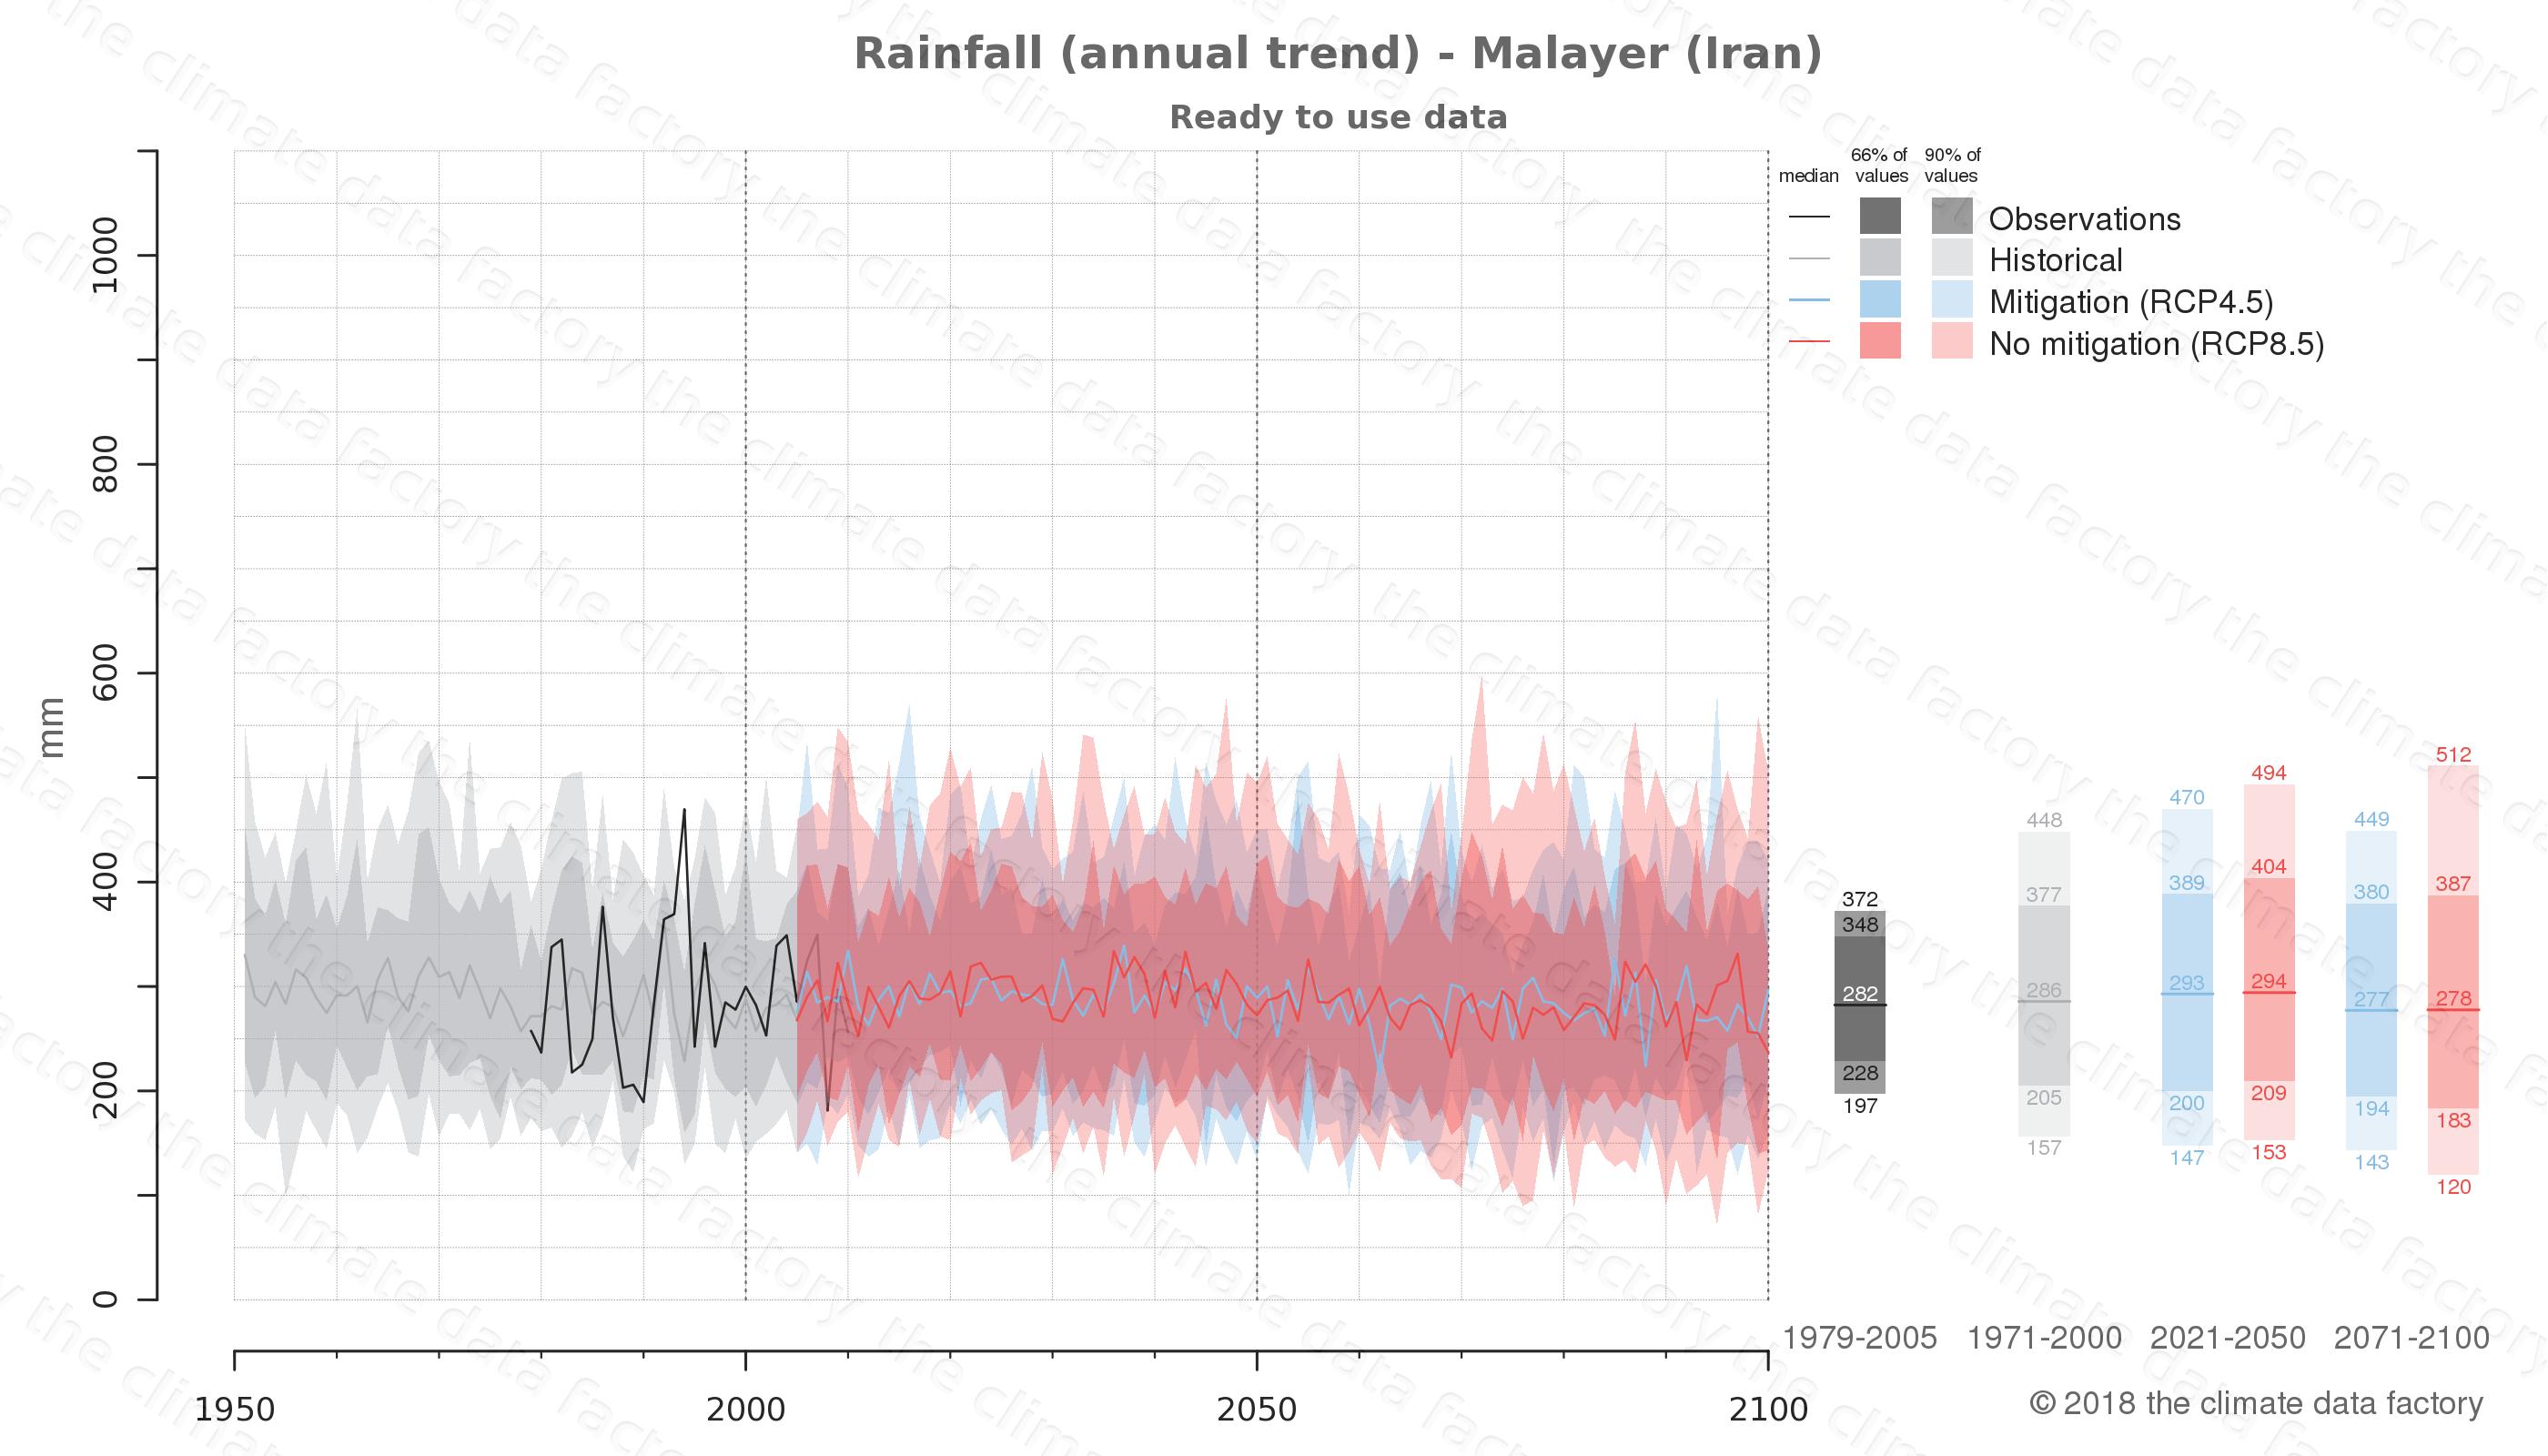 climate change data policy adaptation climate graph city data rainfall malayer iran